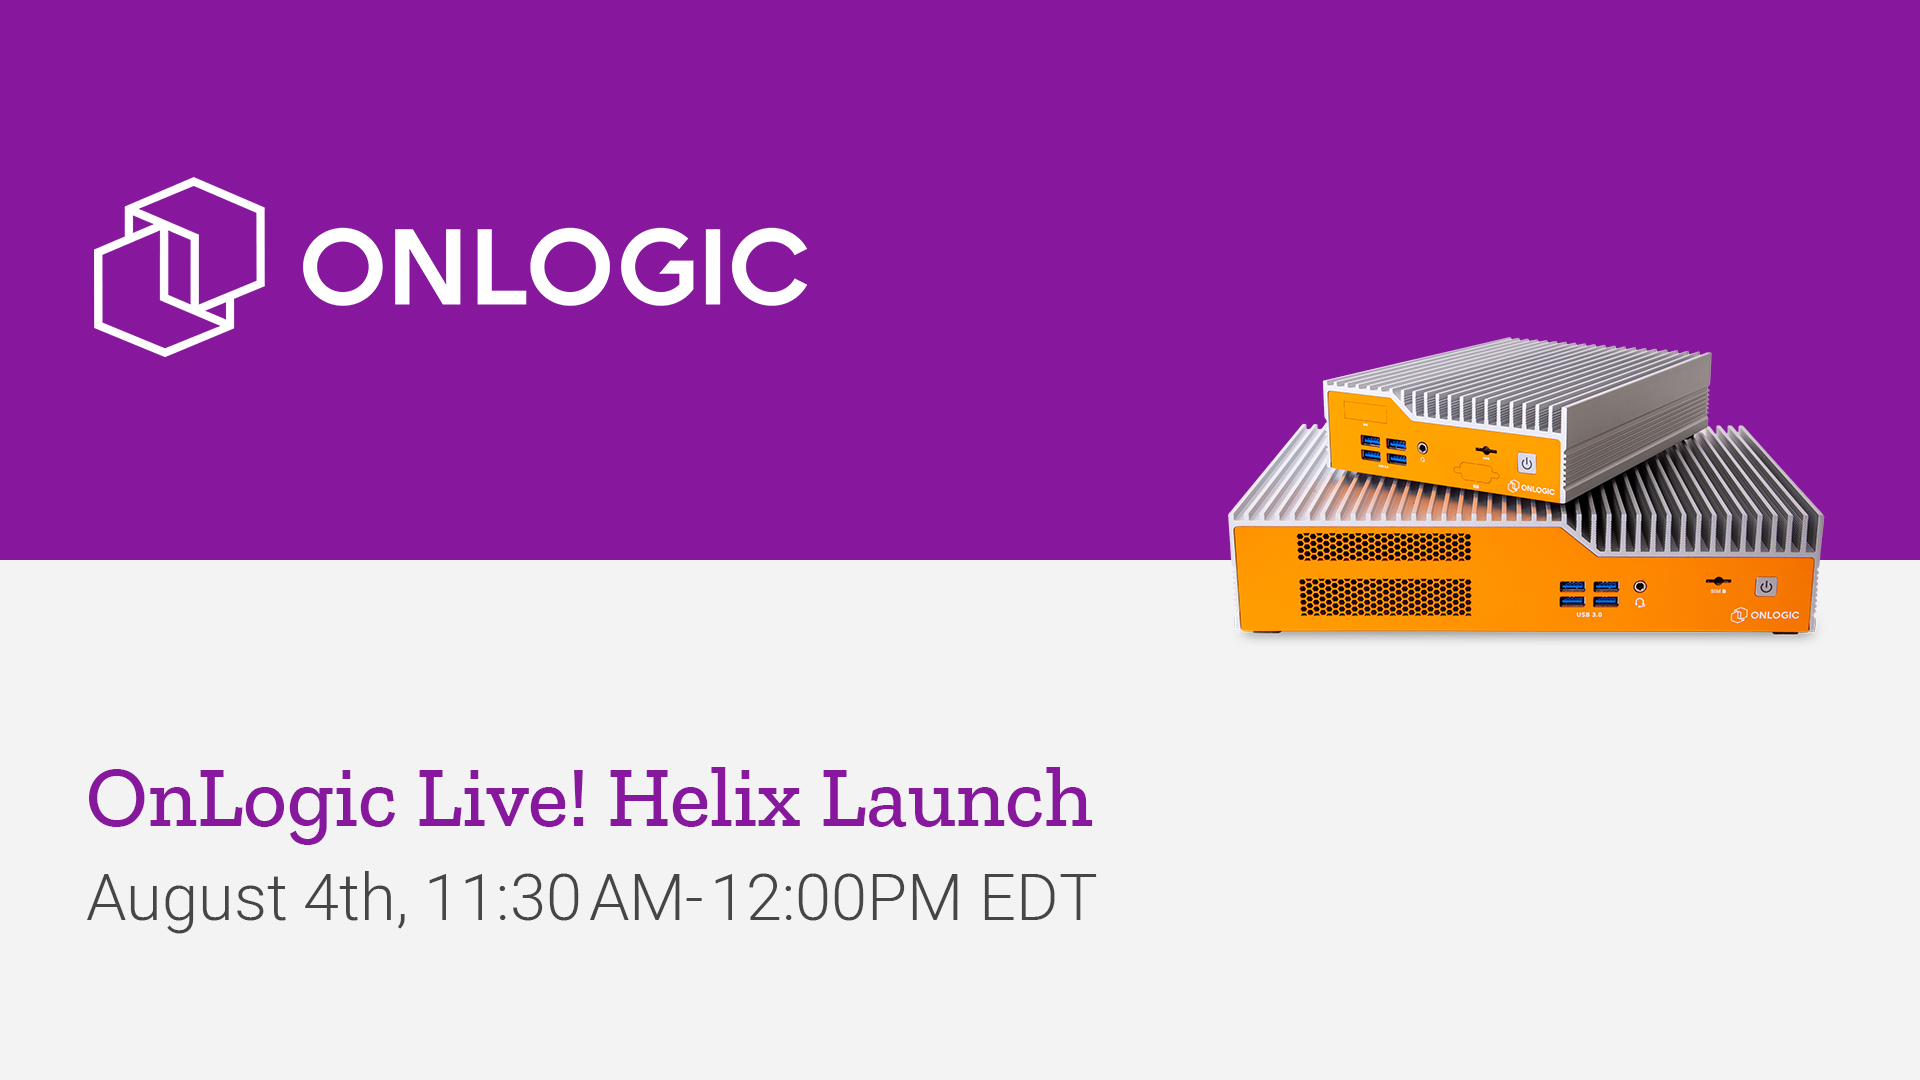 OnLogic Live! Helix Launch